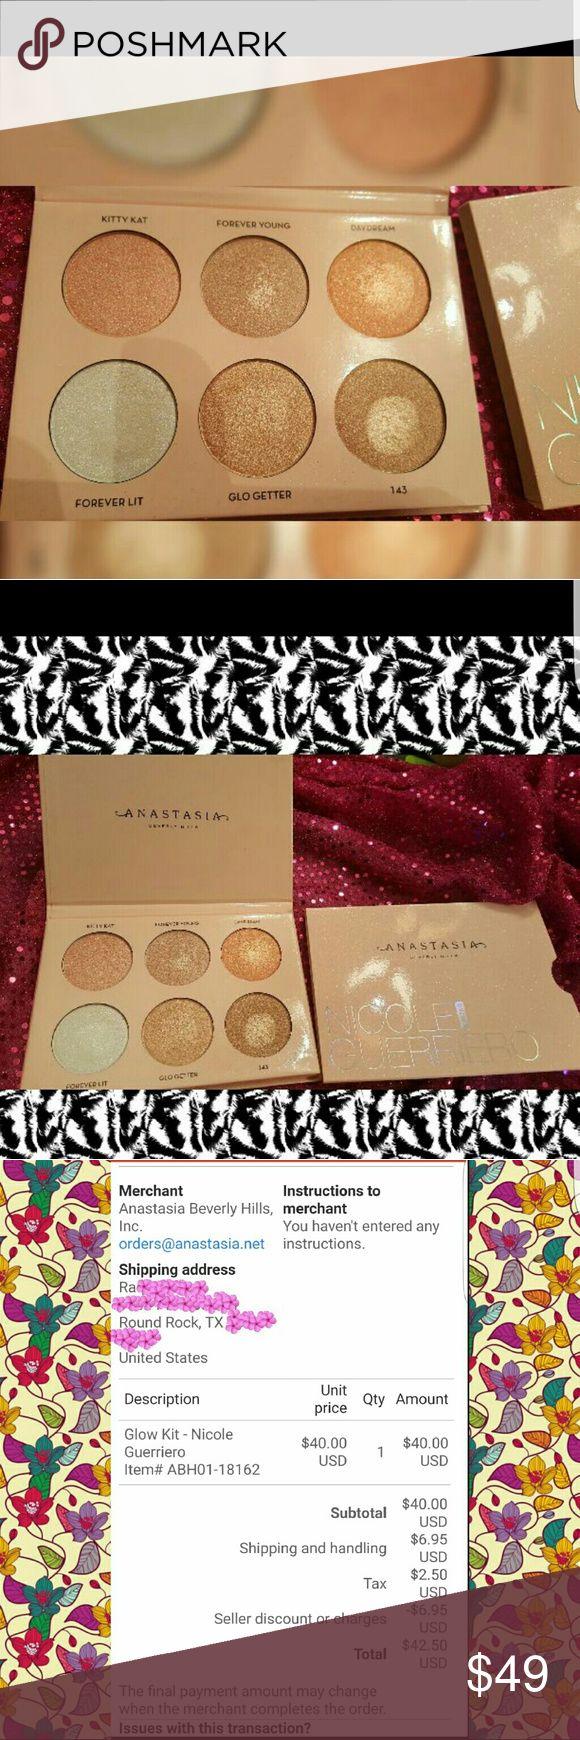 Selling This �❌sold❌❌anastasia Nicole Guerriero Highlight Kit♡ On Poshmark!